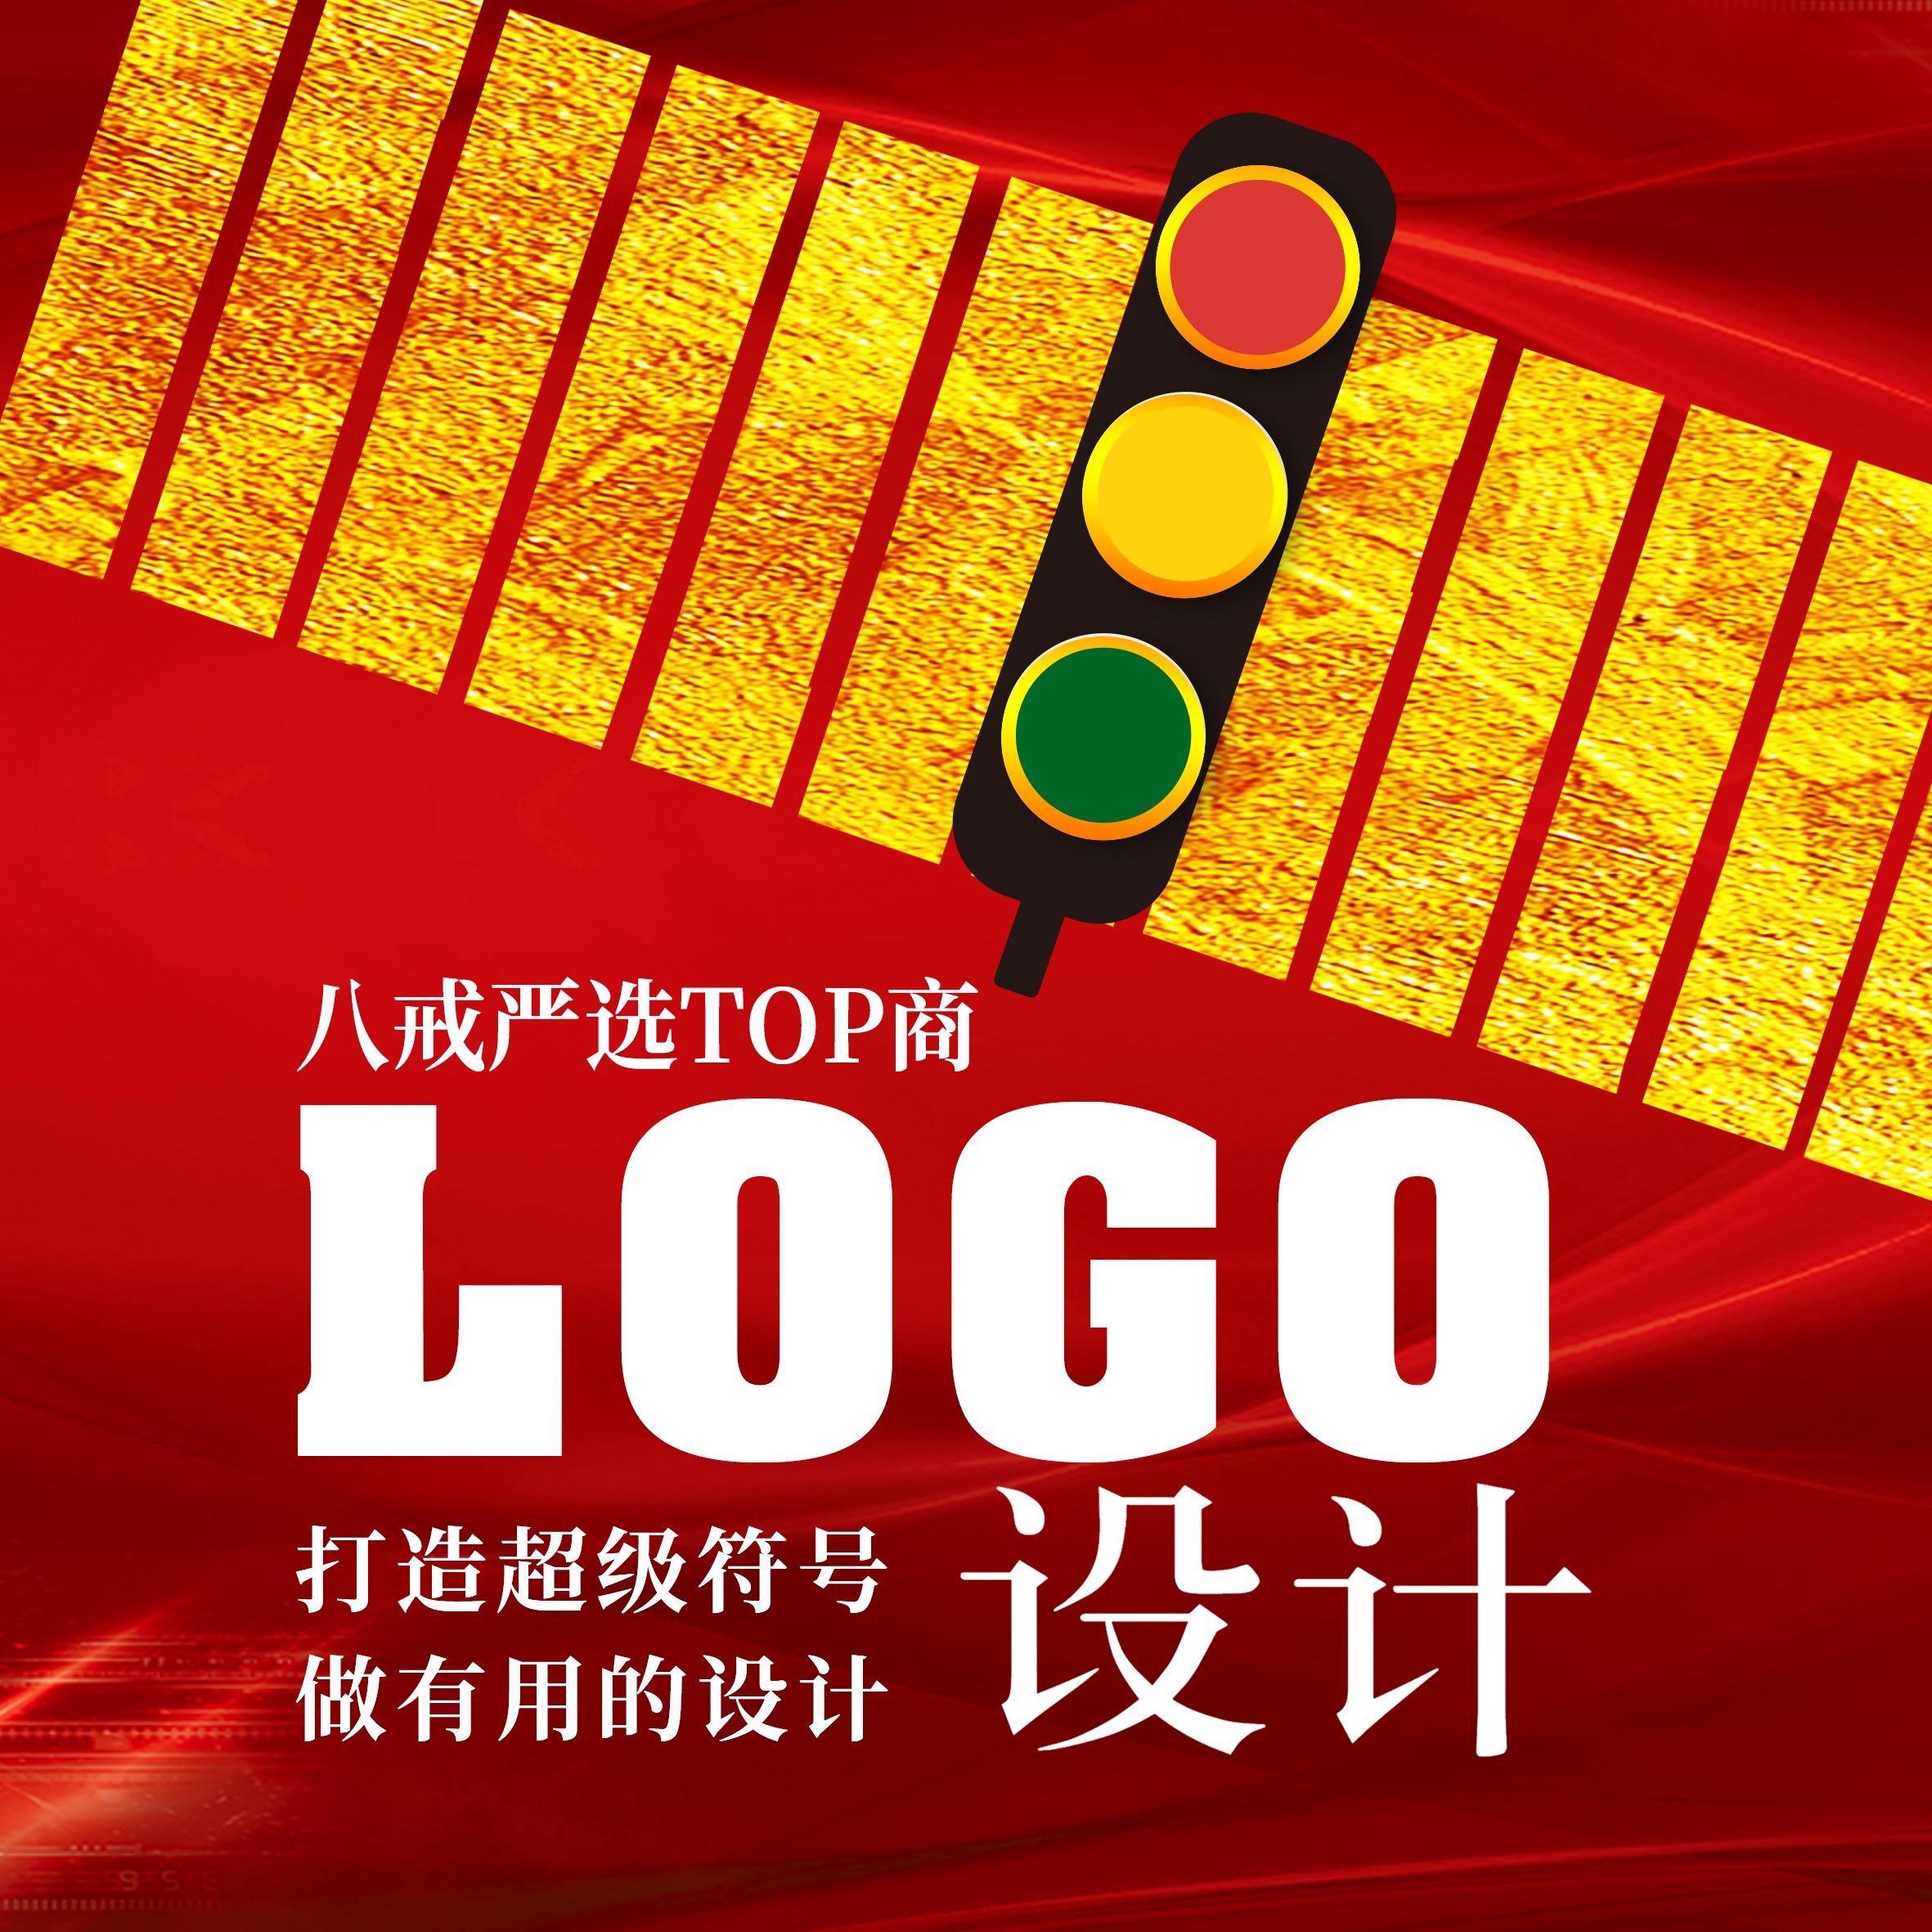 LOGO设计企业酒店餐饮休闲娱乐logo商标标志设计原创标志